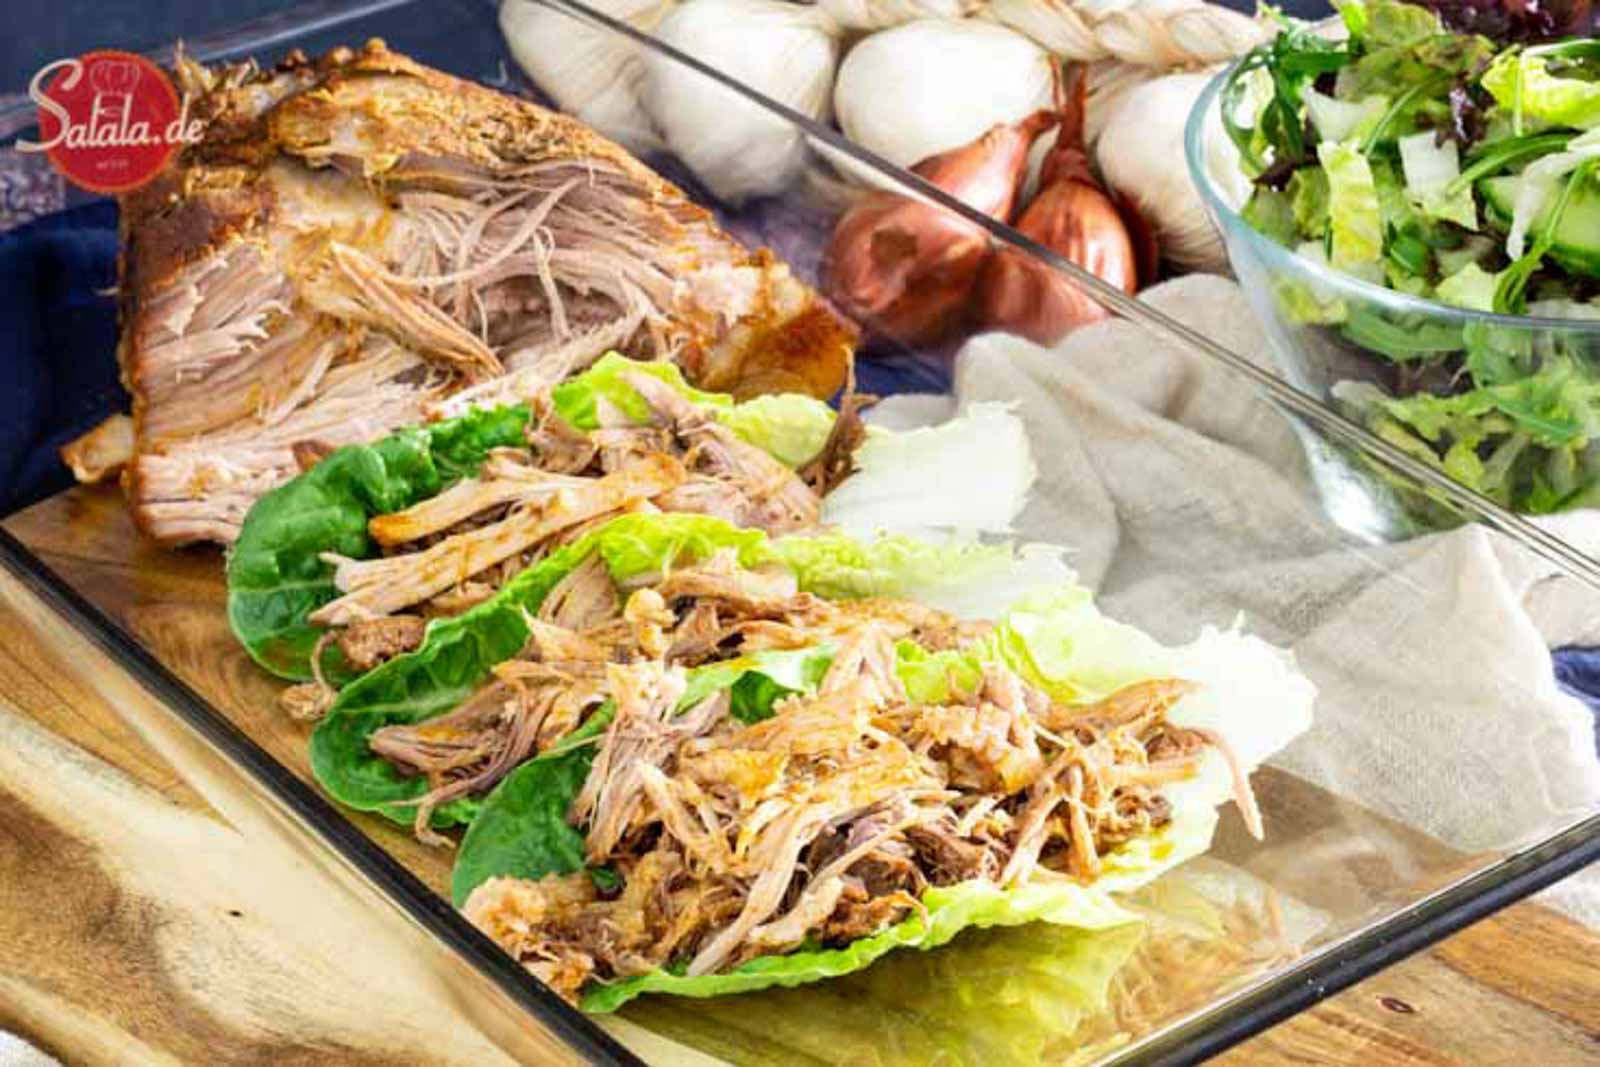 Pulled Pork aus dem Slow Cooker I by salala.de I Low Carb Rezept mit Schweinefleisch